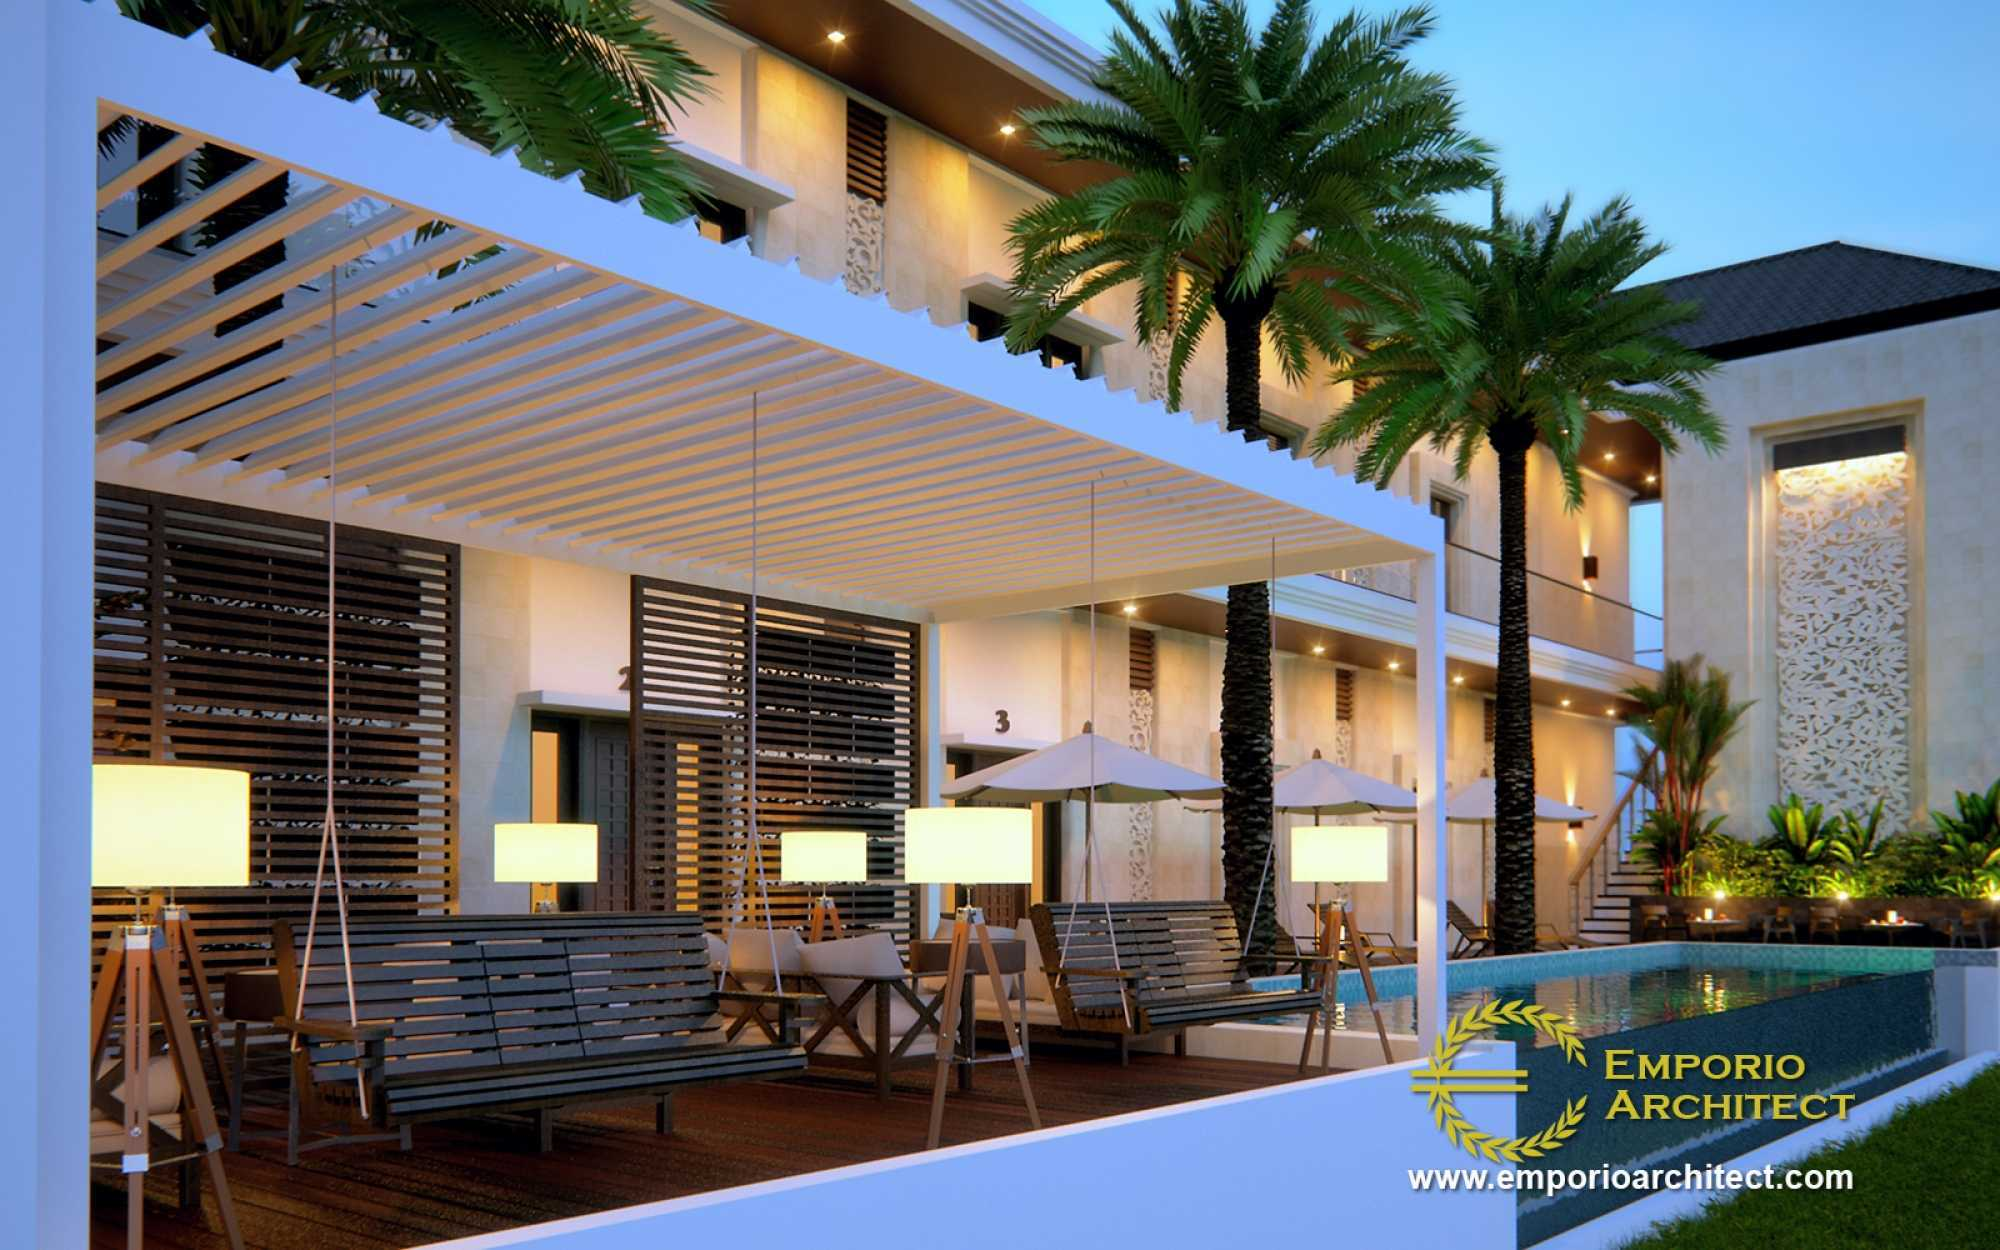 Emporio Architect Desain Hostel Villa Bali Tropis 311 @ Berawa, Canggu, Bali A Branch Of Serenity Eco Guesthouse, Just 2.6 Km Away, Canggu, Badung, Kabupaten Badung, Bali 80361, Indonesia A Branch Of Serenity Eco Guesthouse, Just 2.6 Km Away, Canggu, Badung, Kabupaten Badung, Bali 80361, Indonesia Emporio-Architect-Desain-Hostel-Villa-Bali-Tropis-311-Berawa-Canggu-Bali  74007